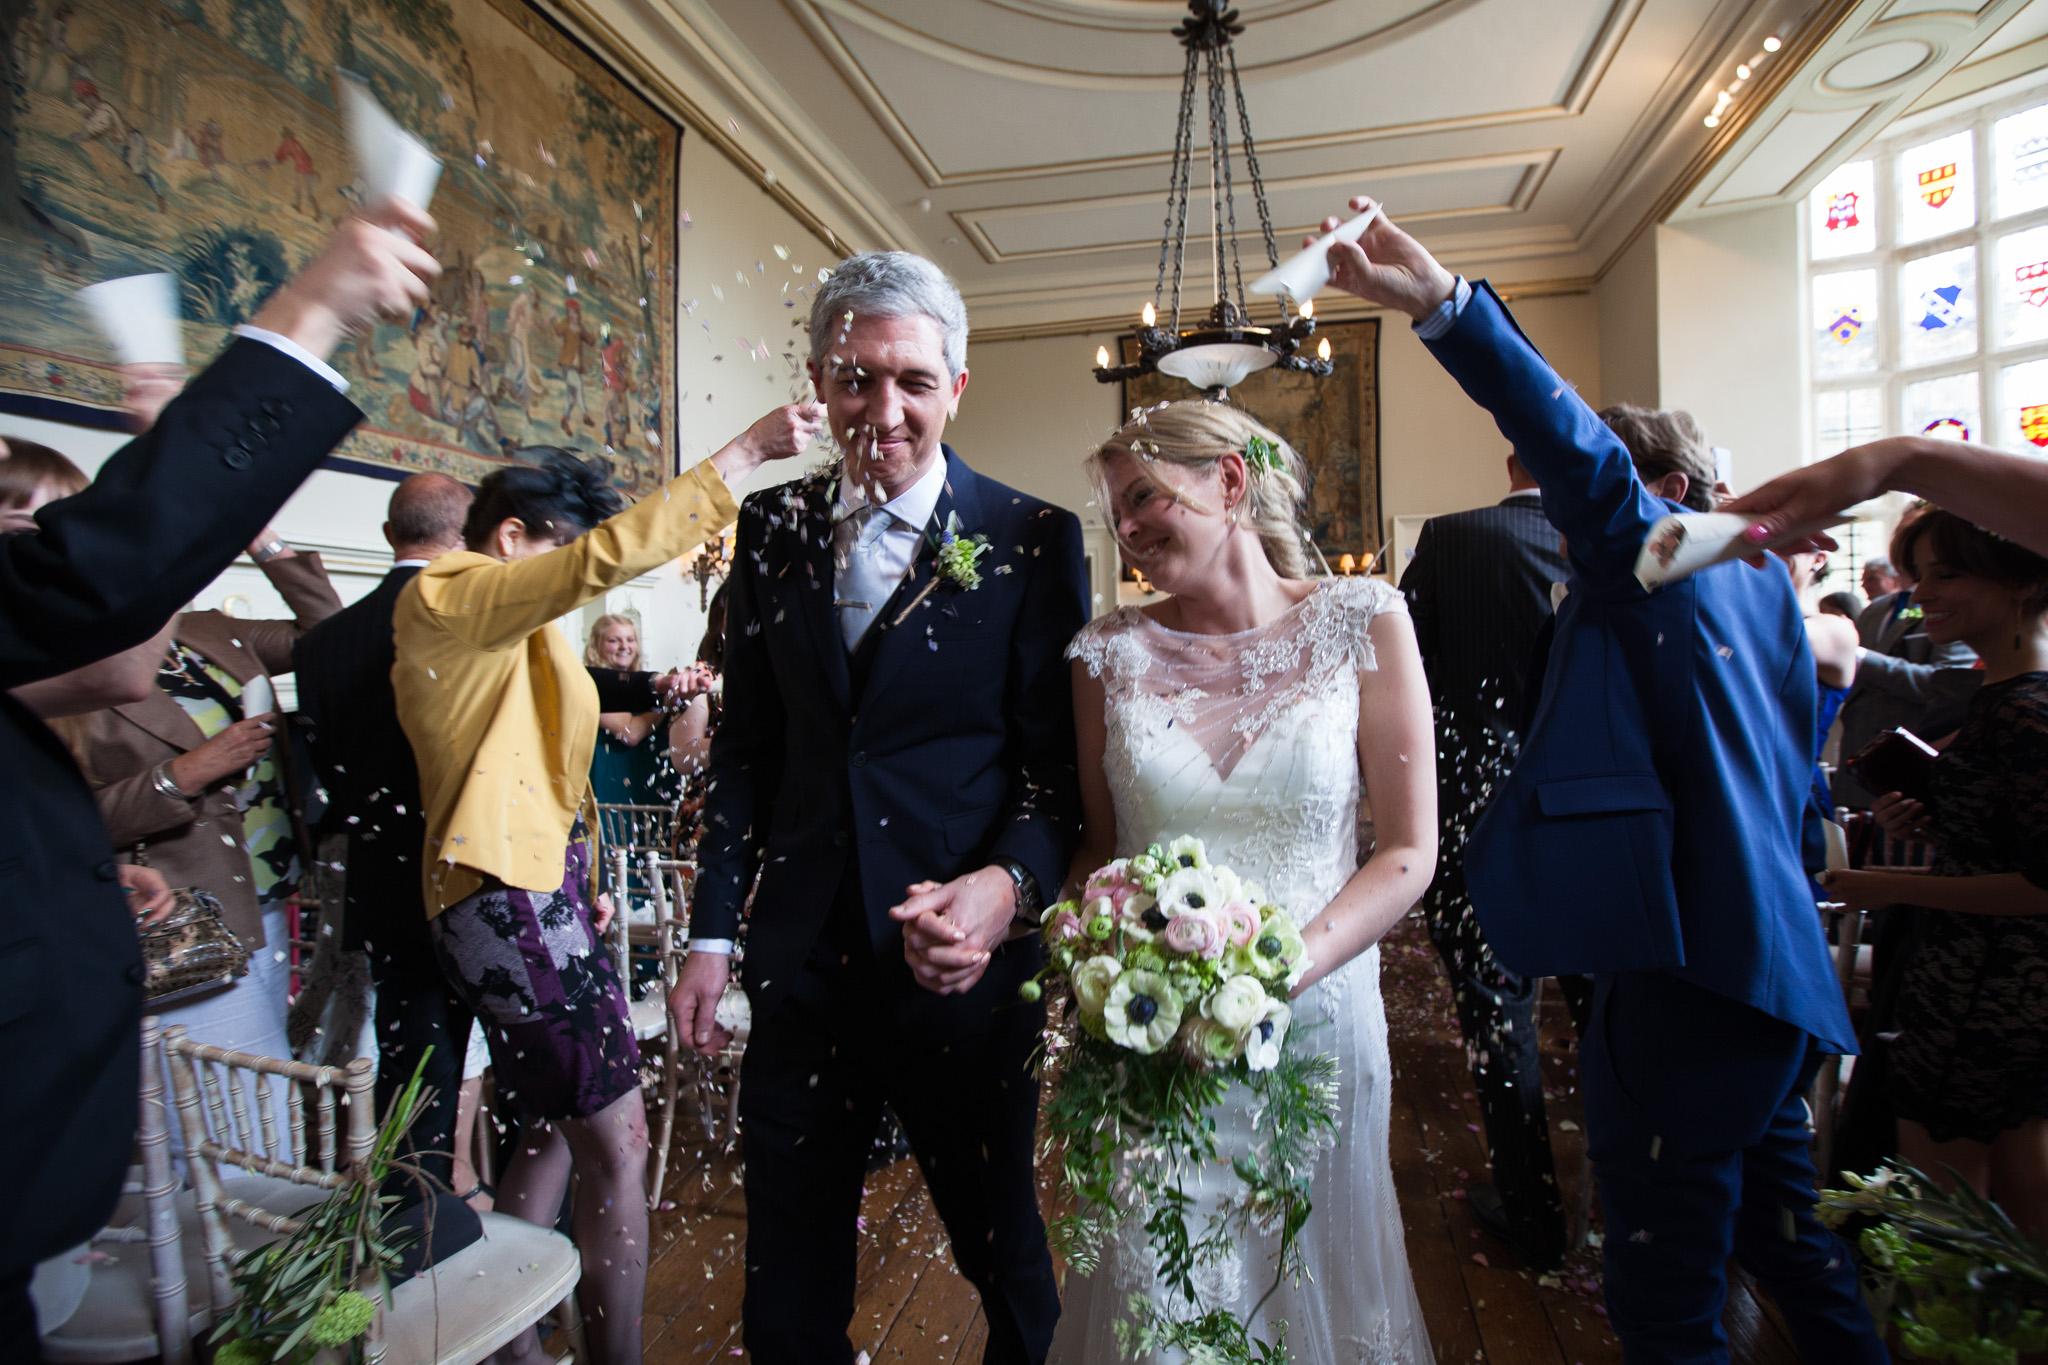 Mark_Barnes_Gloucester_Wedding_Photographer_Elmore_Court_Wedding_Photography_Mike+Kelly-55.jpg